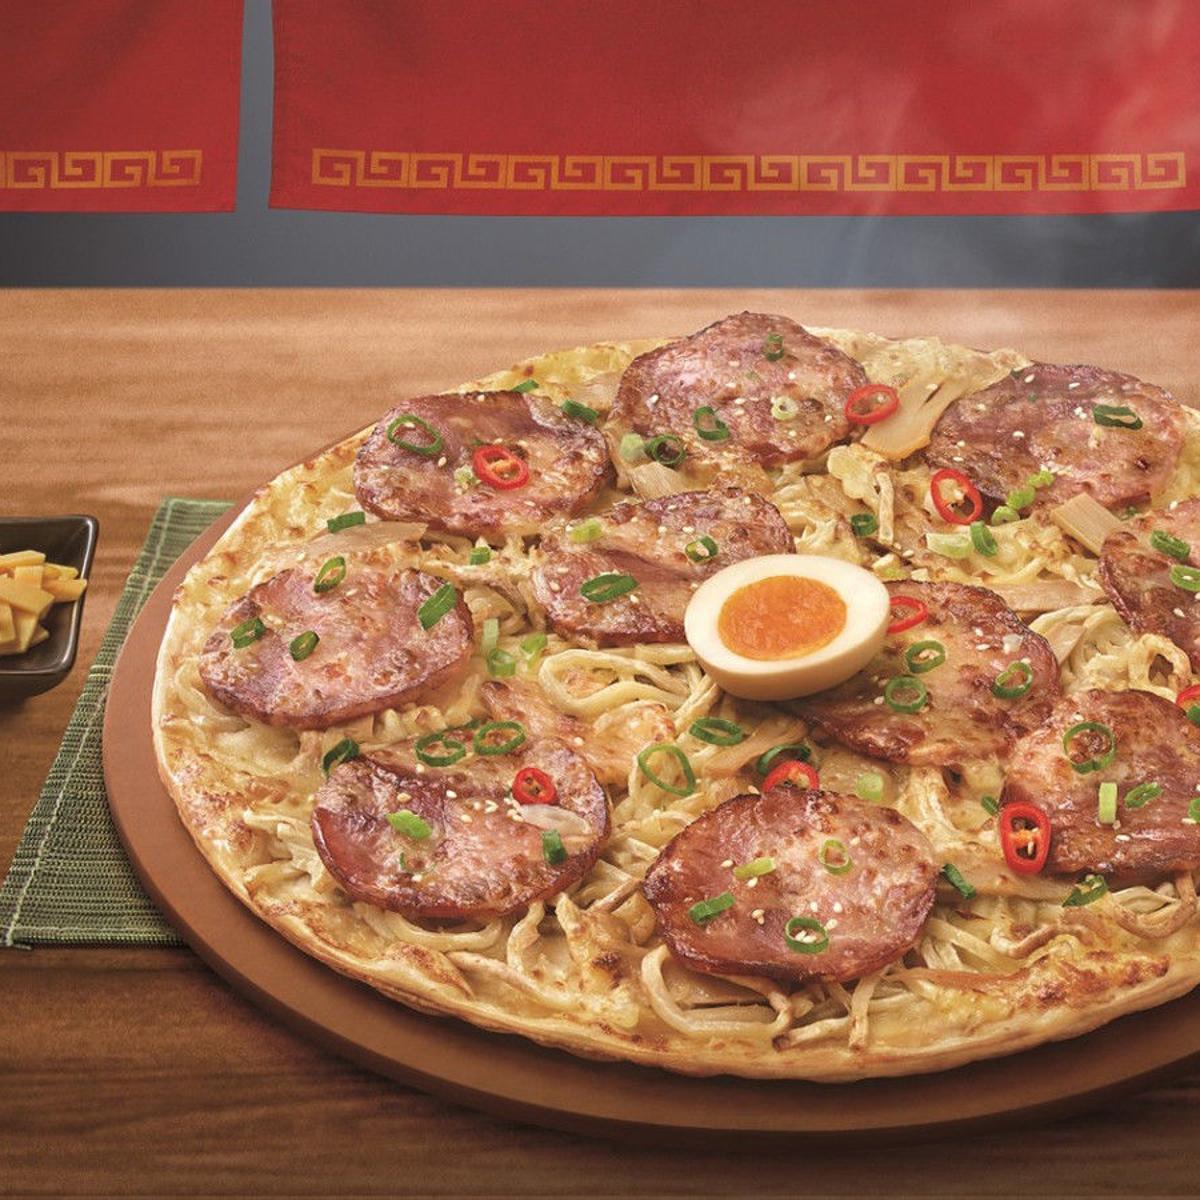 Pizza Hut Taiwan Unveils Its Latest Boundary Pushing Mashup Ramen Pizza Madison Com Recipes Food And Cooking Tips Madison Com